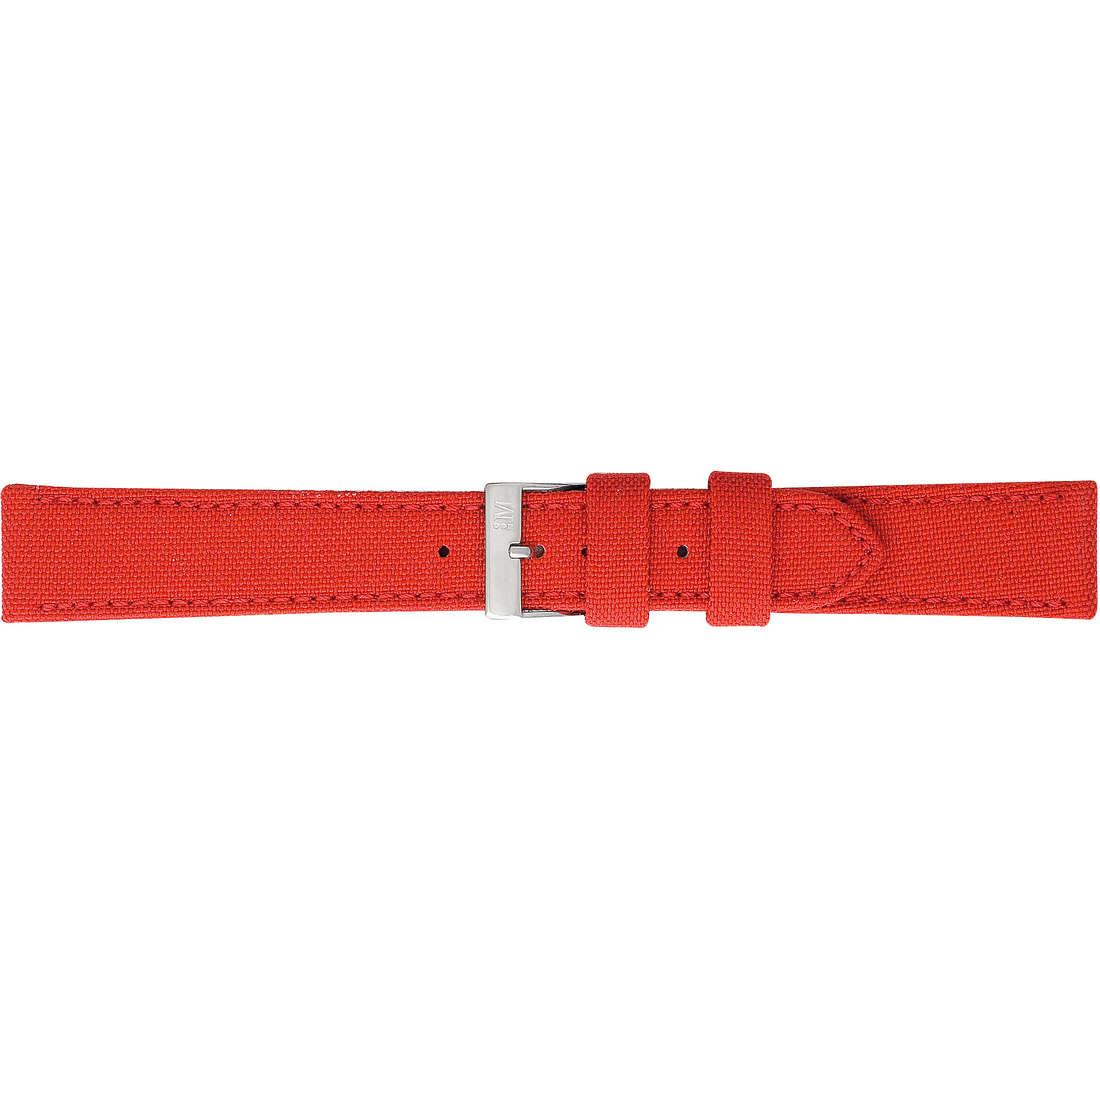 montre bande de montres homme Morellato Linea Sport A01U2779110083CR22